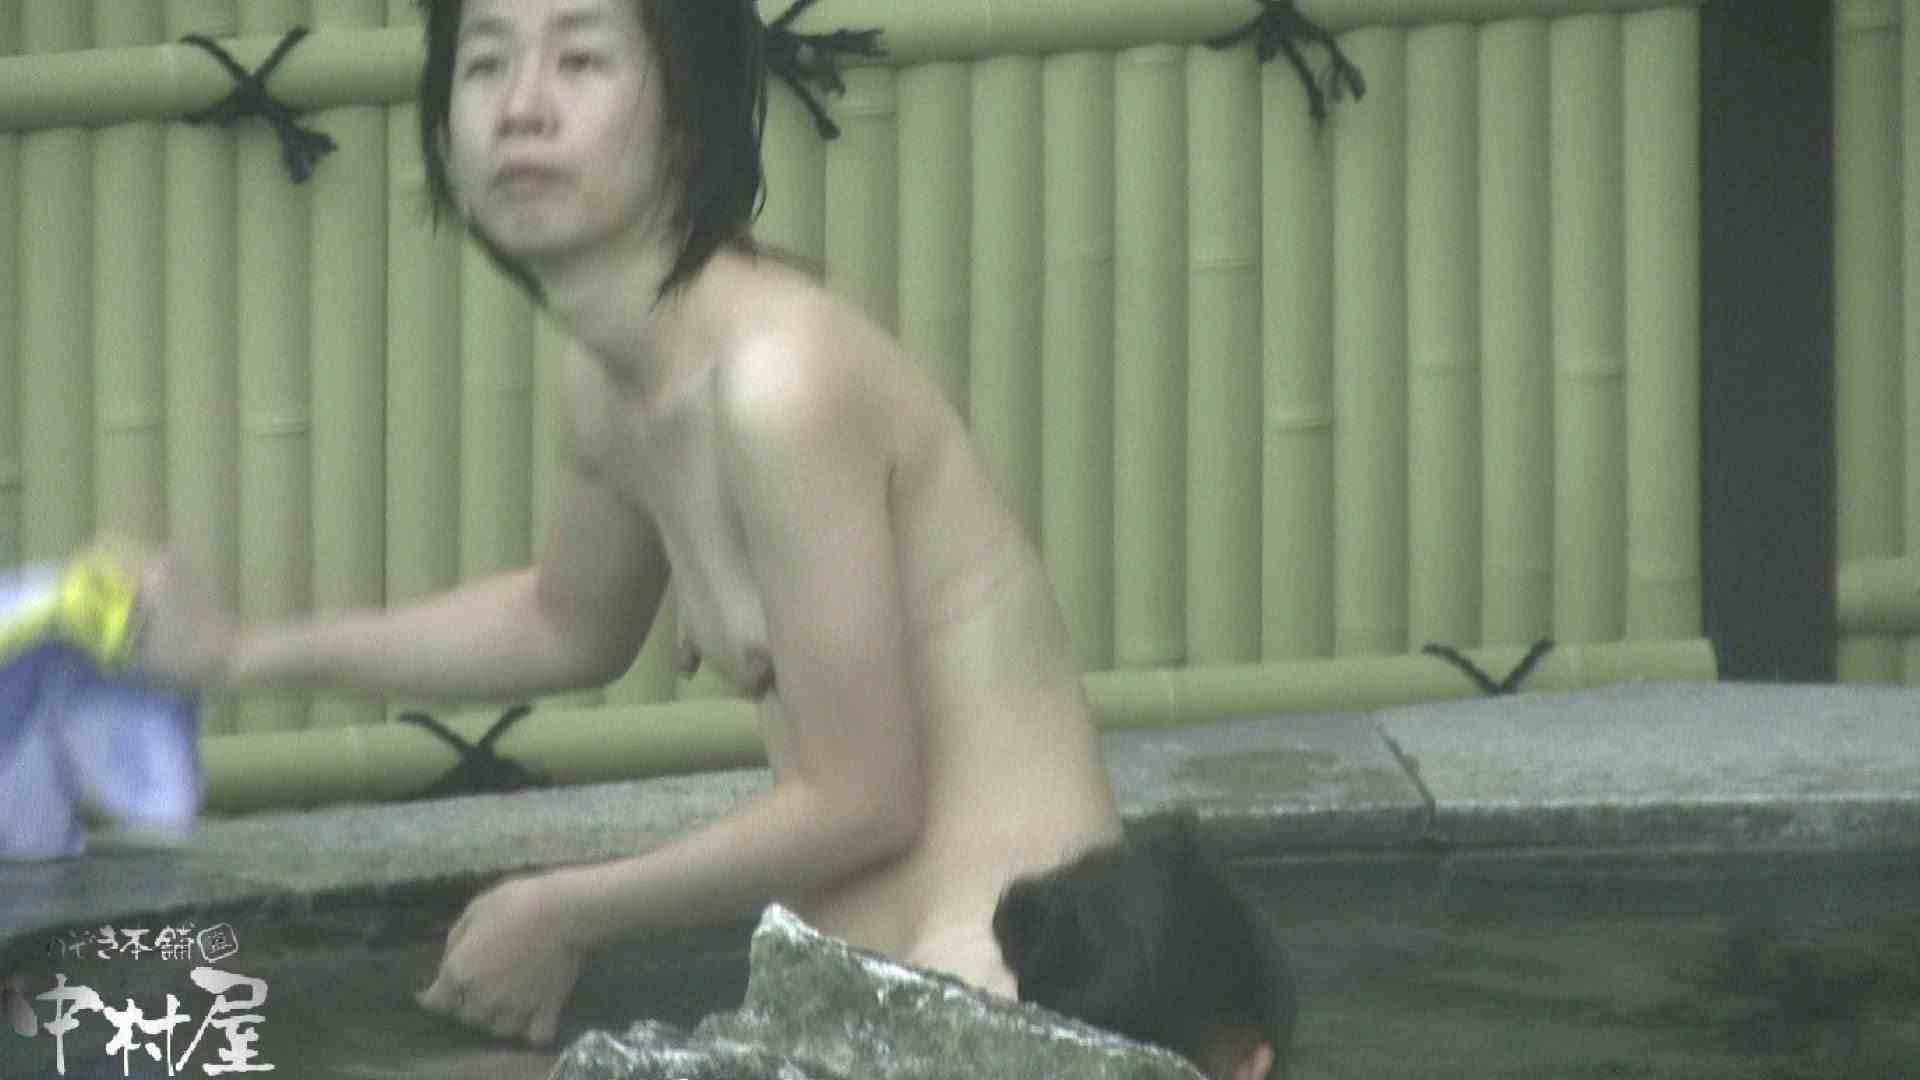 Aquaな露天風呂Vol.911 0  88連発 42